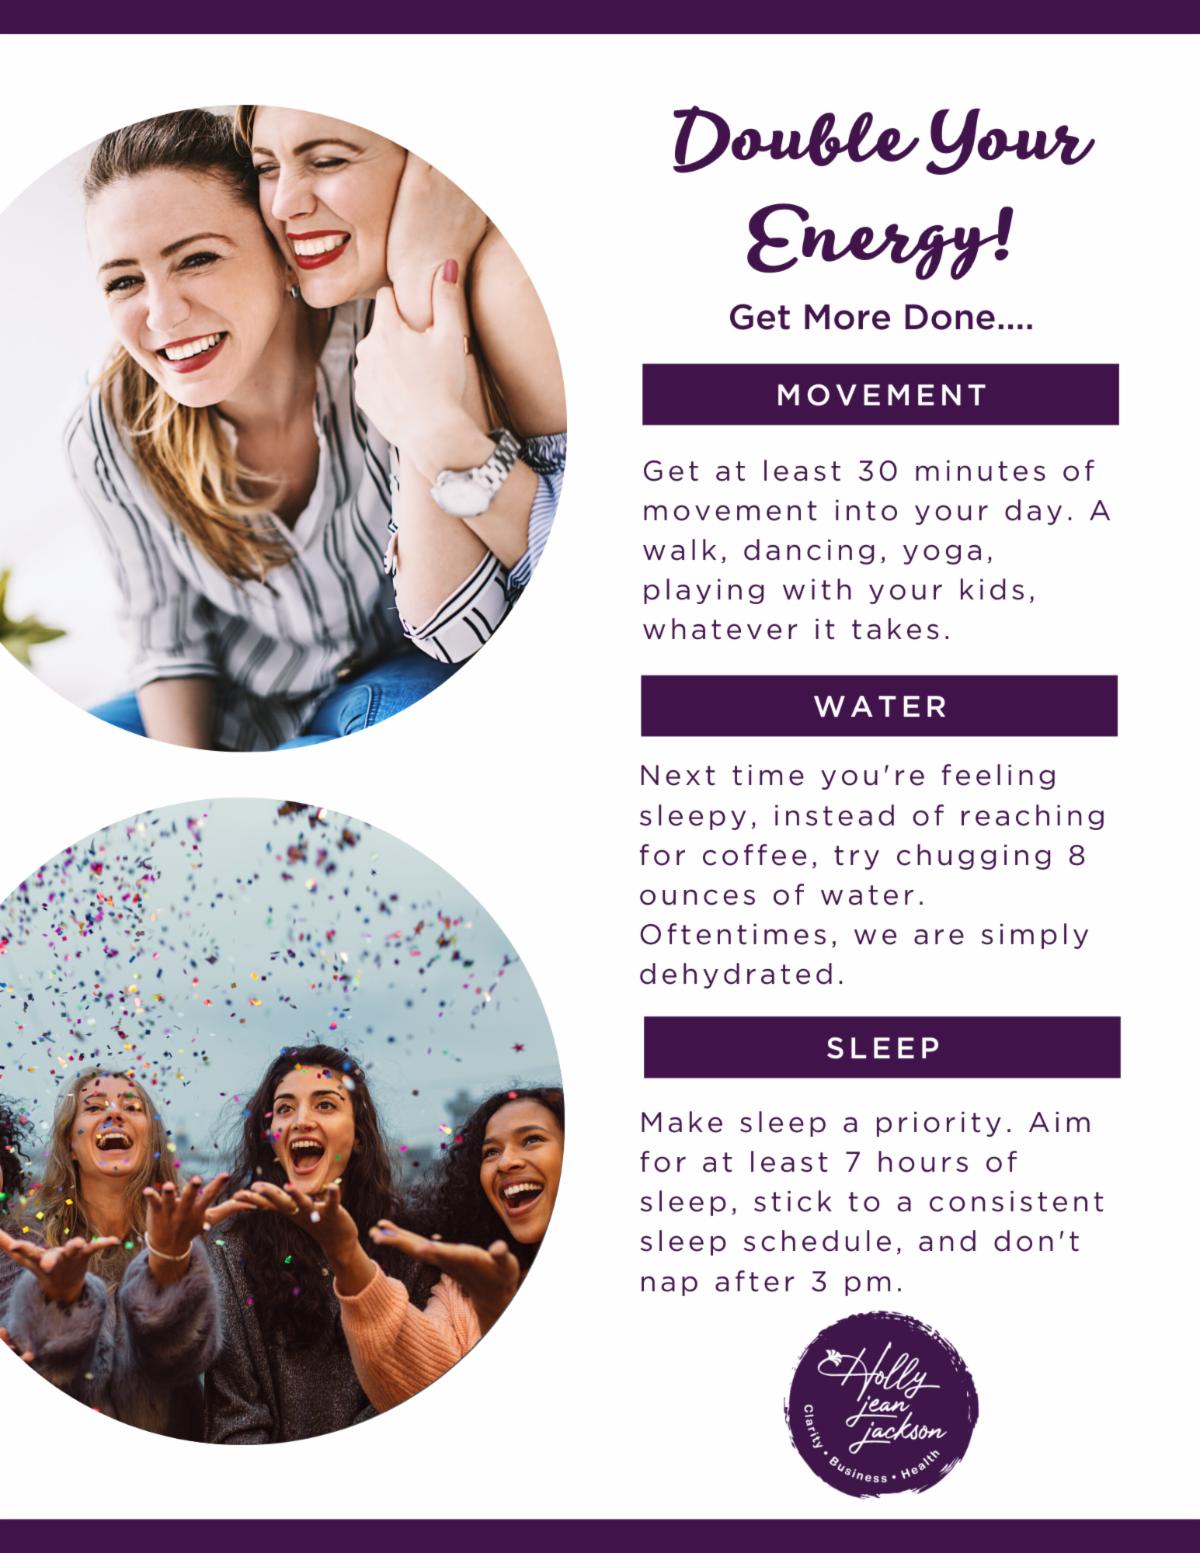 Double Your Energy